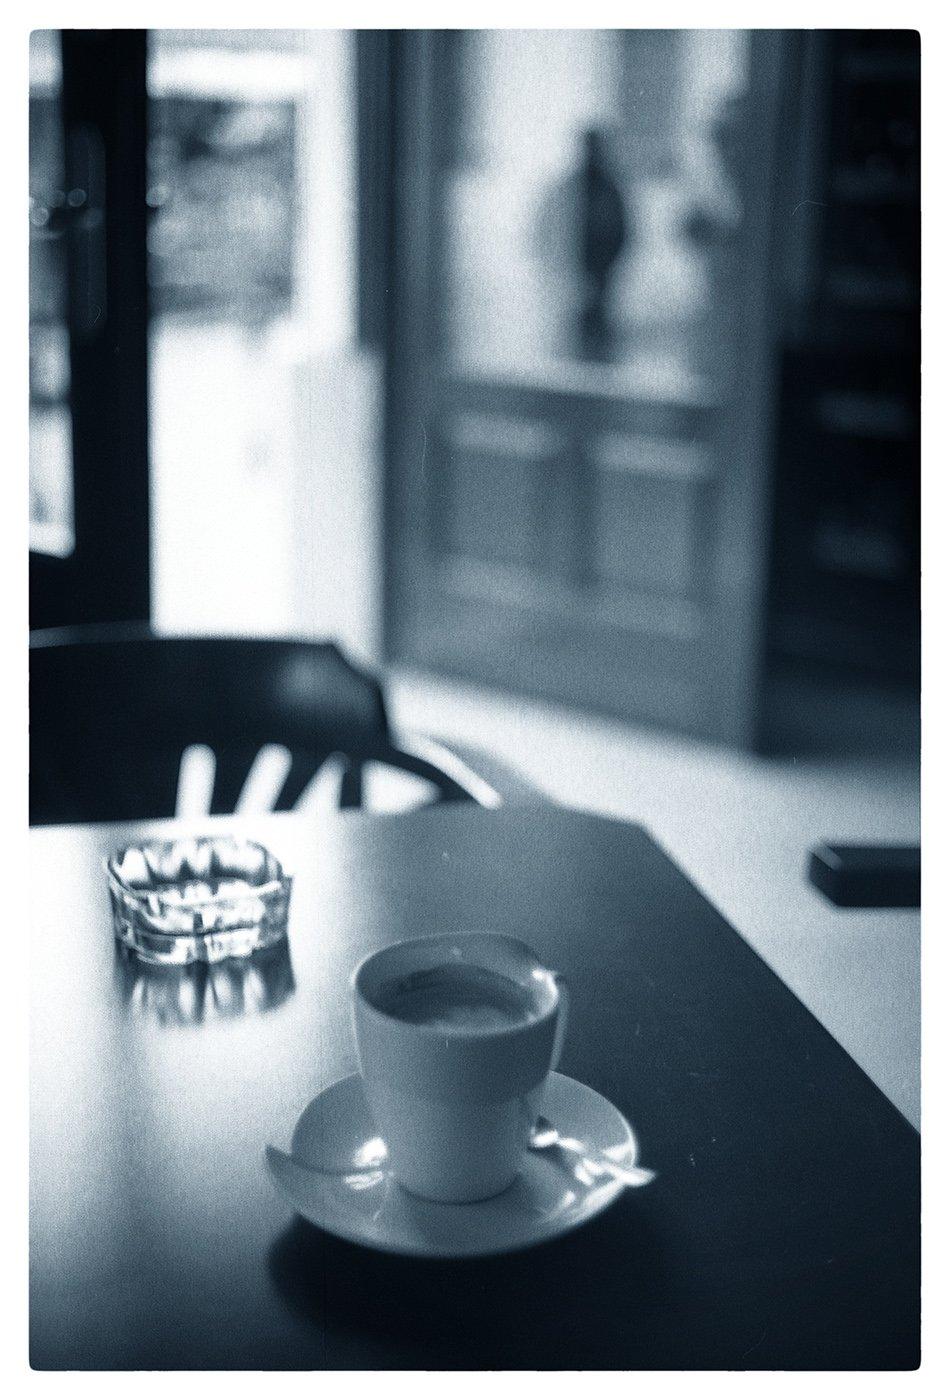 PICTOGRAMAX - 2010 - OLYMPUS 35SP + ILFORDHP5 400 - SOFT DRINK.jpg